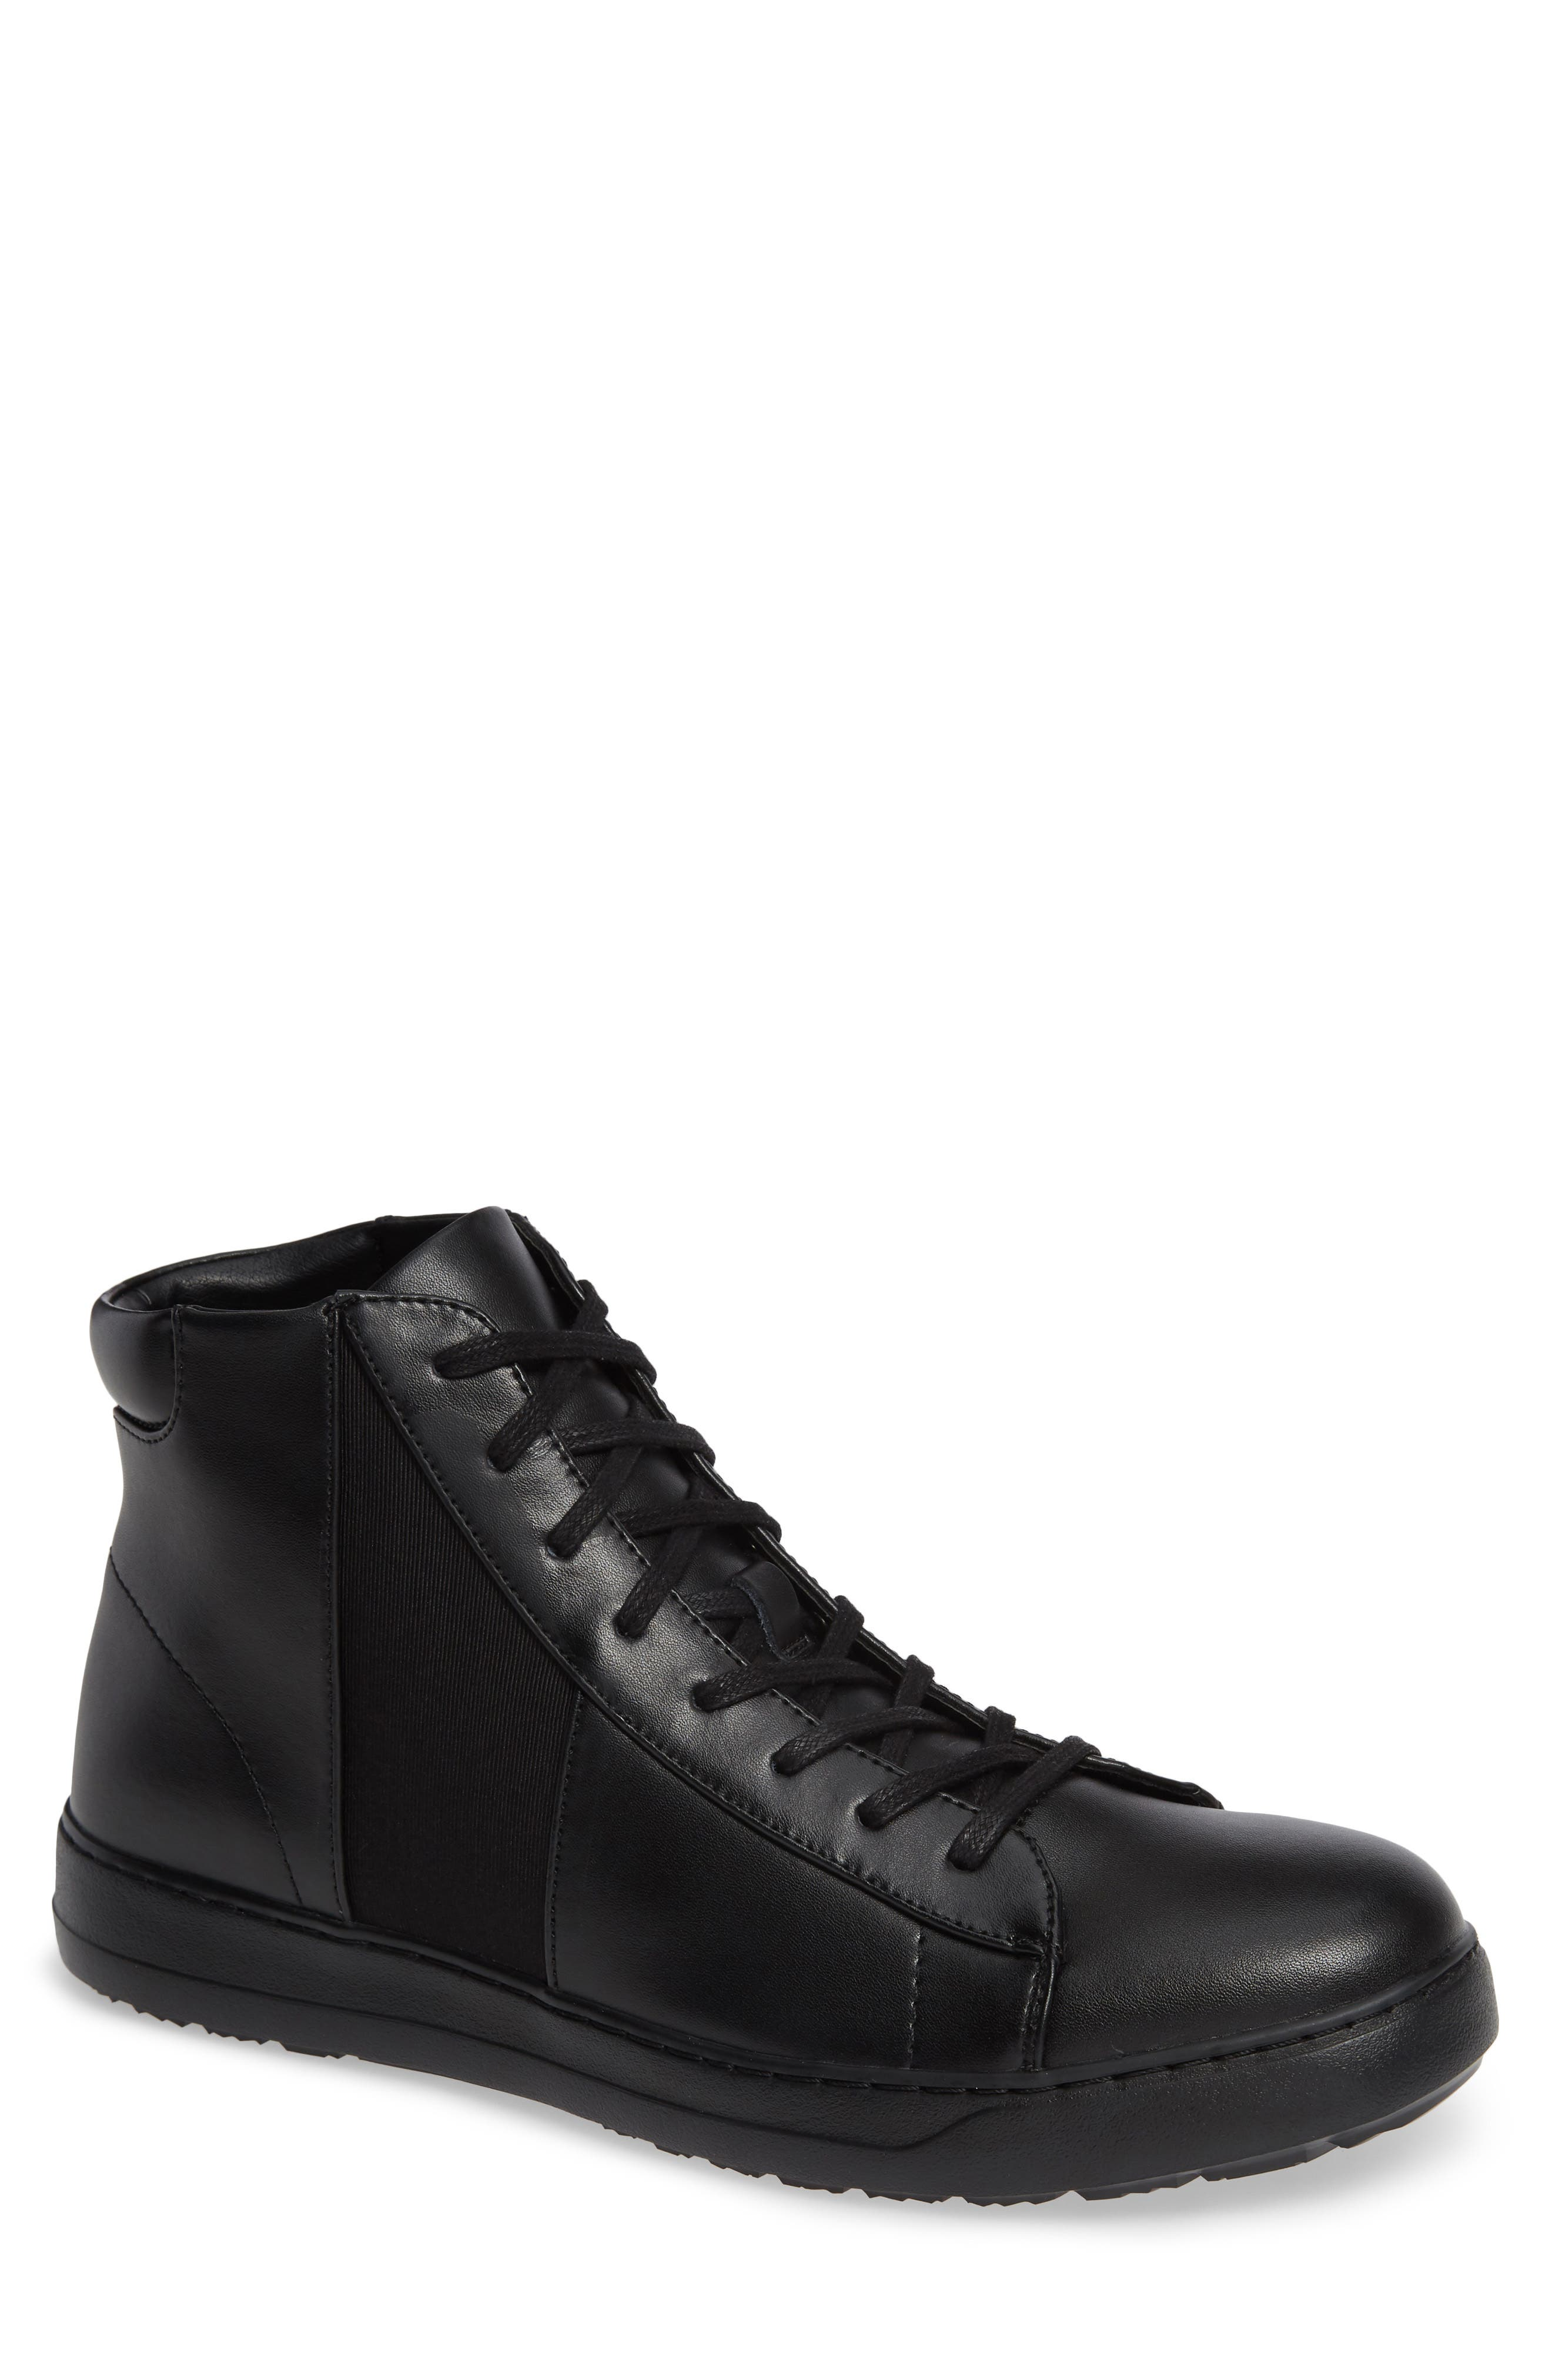 Salvador High Top Sneaker,                             Main thumbnail 1, color,                             BLACK/ BLACK LEATHER